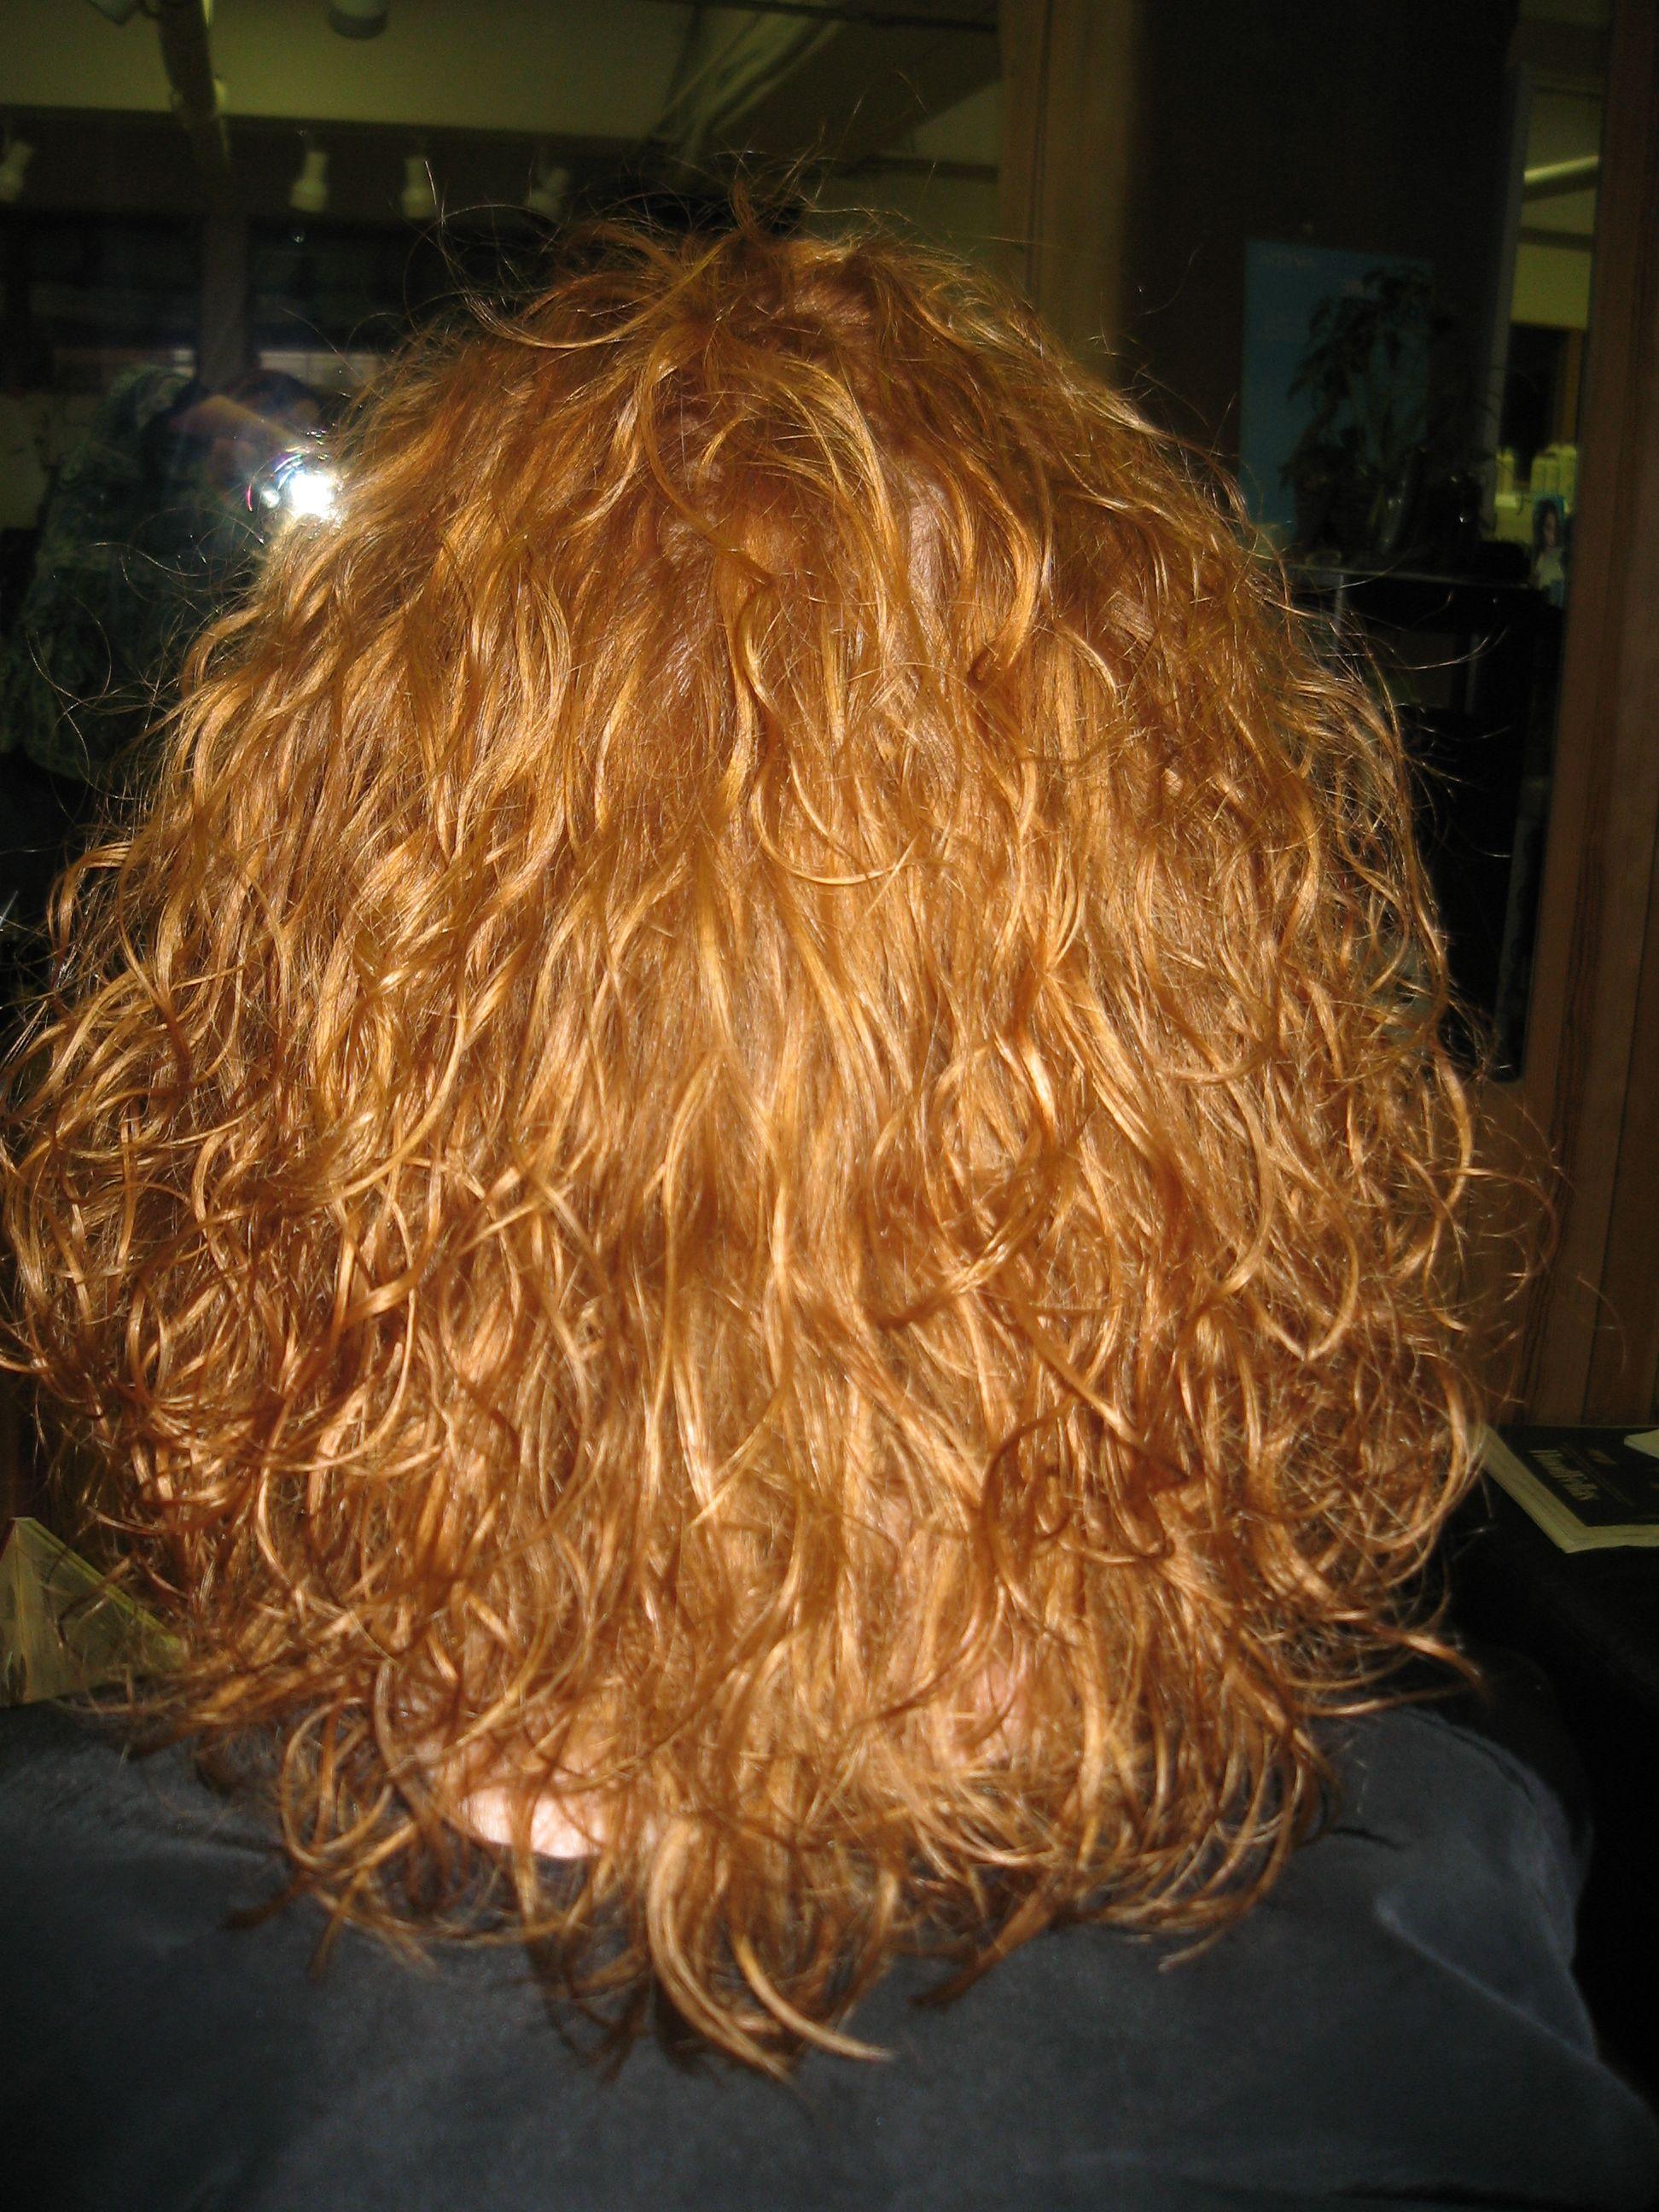 Best Perms For Fine Hair Hairstyles Idea Hair Hair